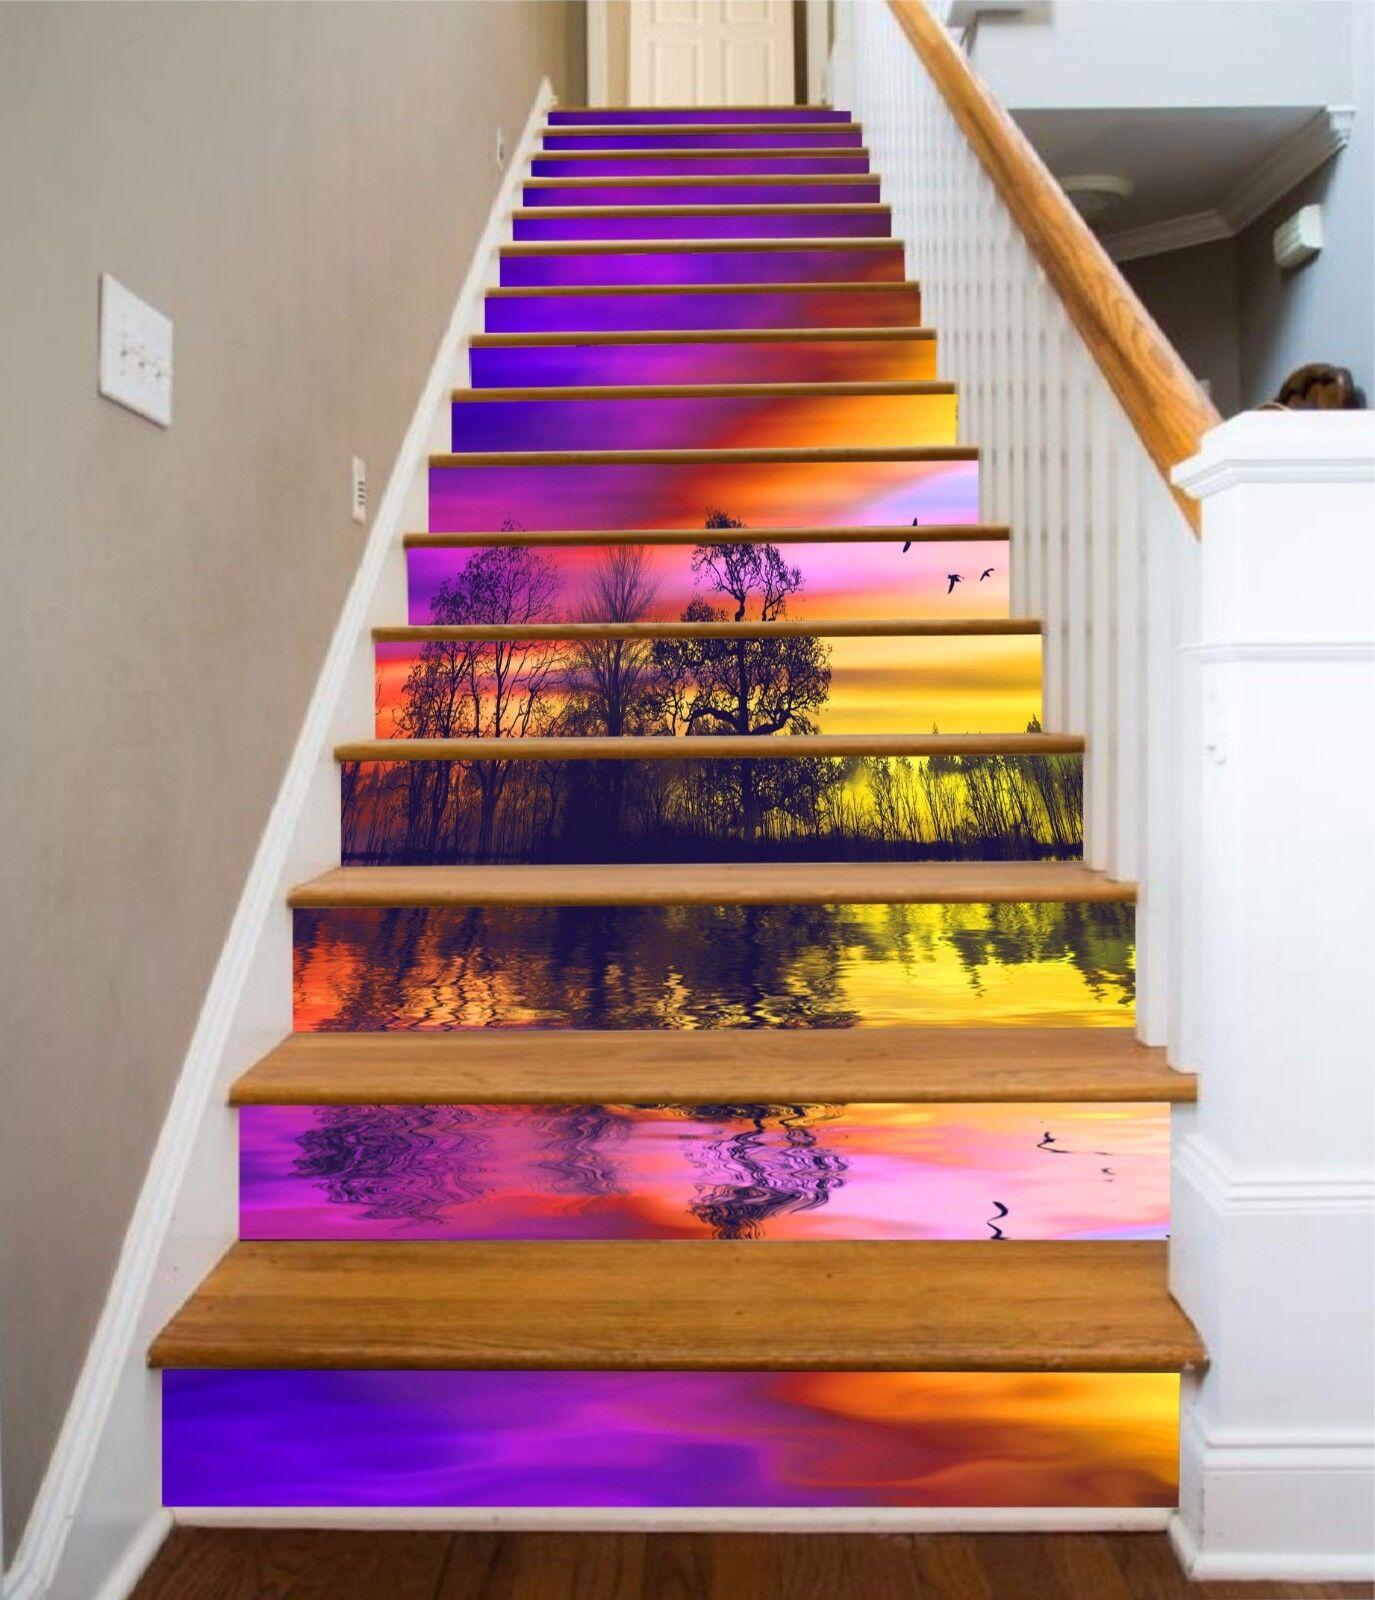 3D Twilight Sea 837 Stair Risers Decoration Photo Mural Vinyl Decal Wallpaper AU